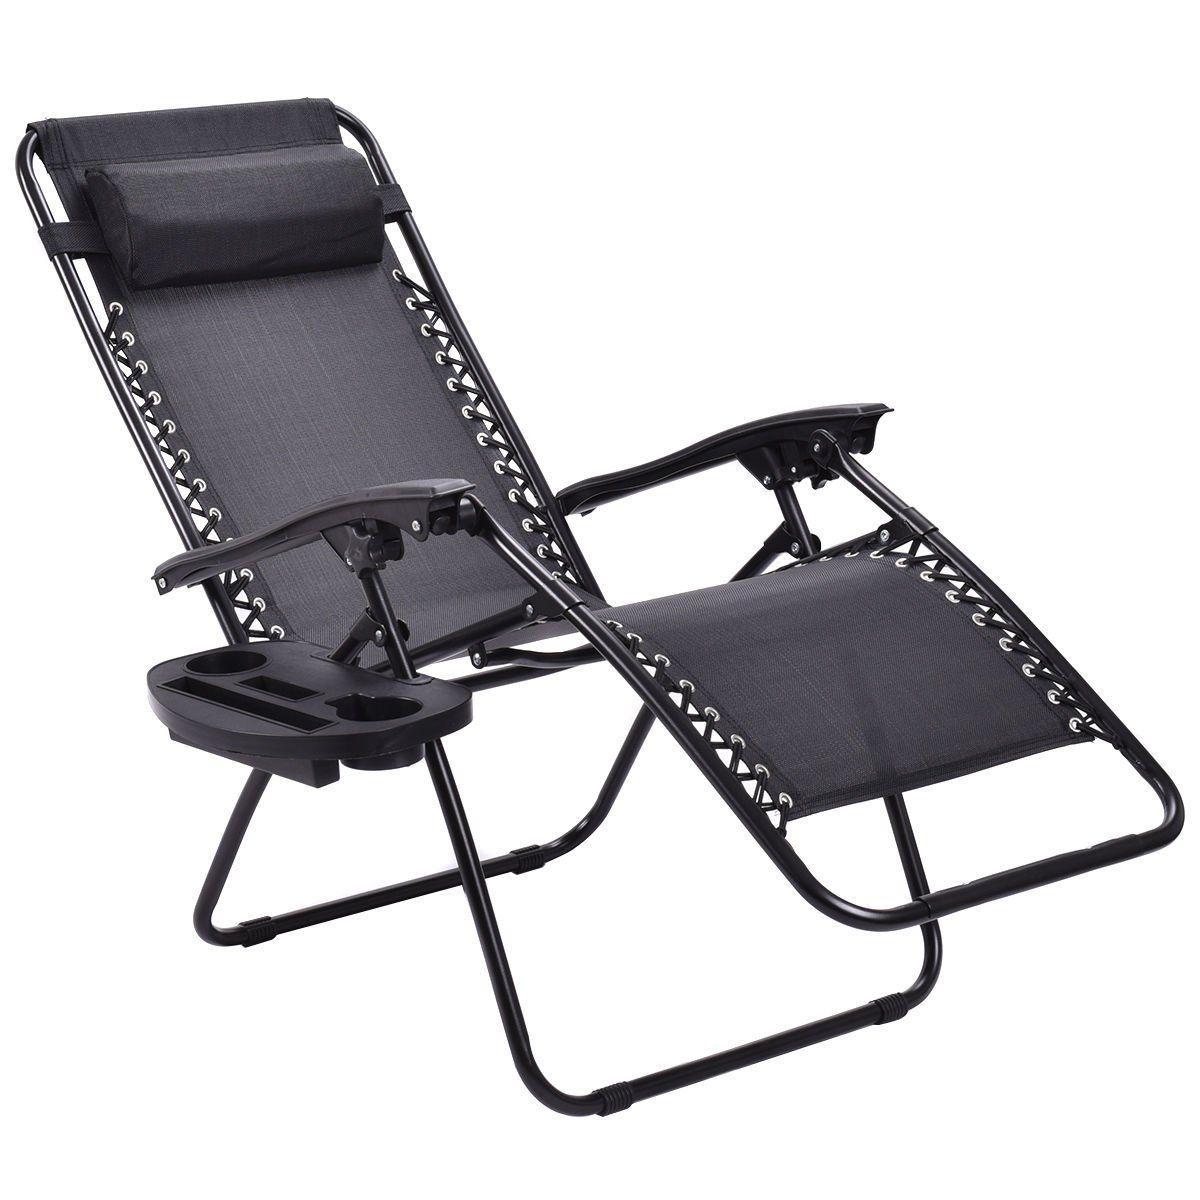 Goplus Zero Gravity Chairs Lounge Patio Folding Recliner